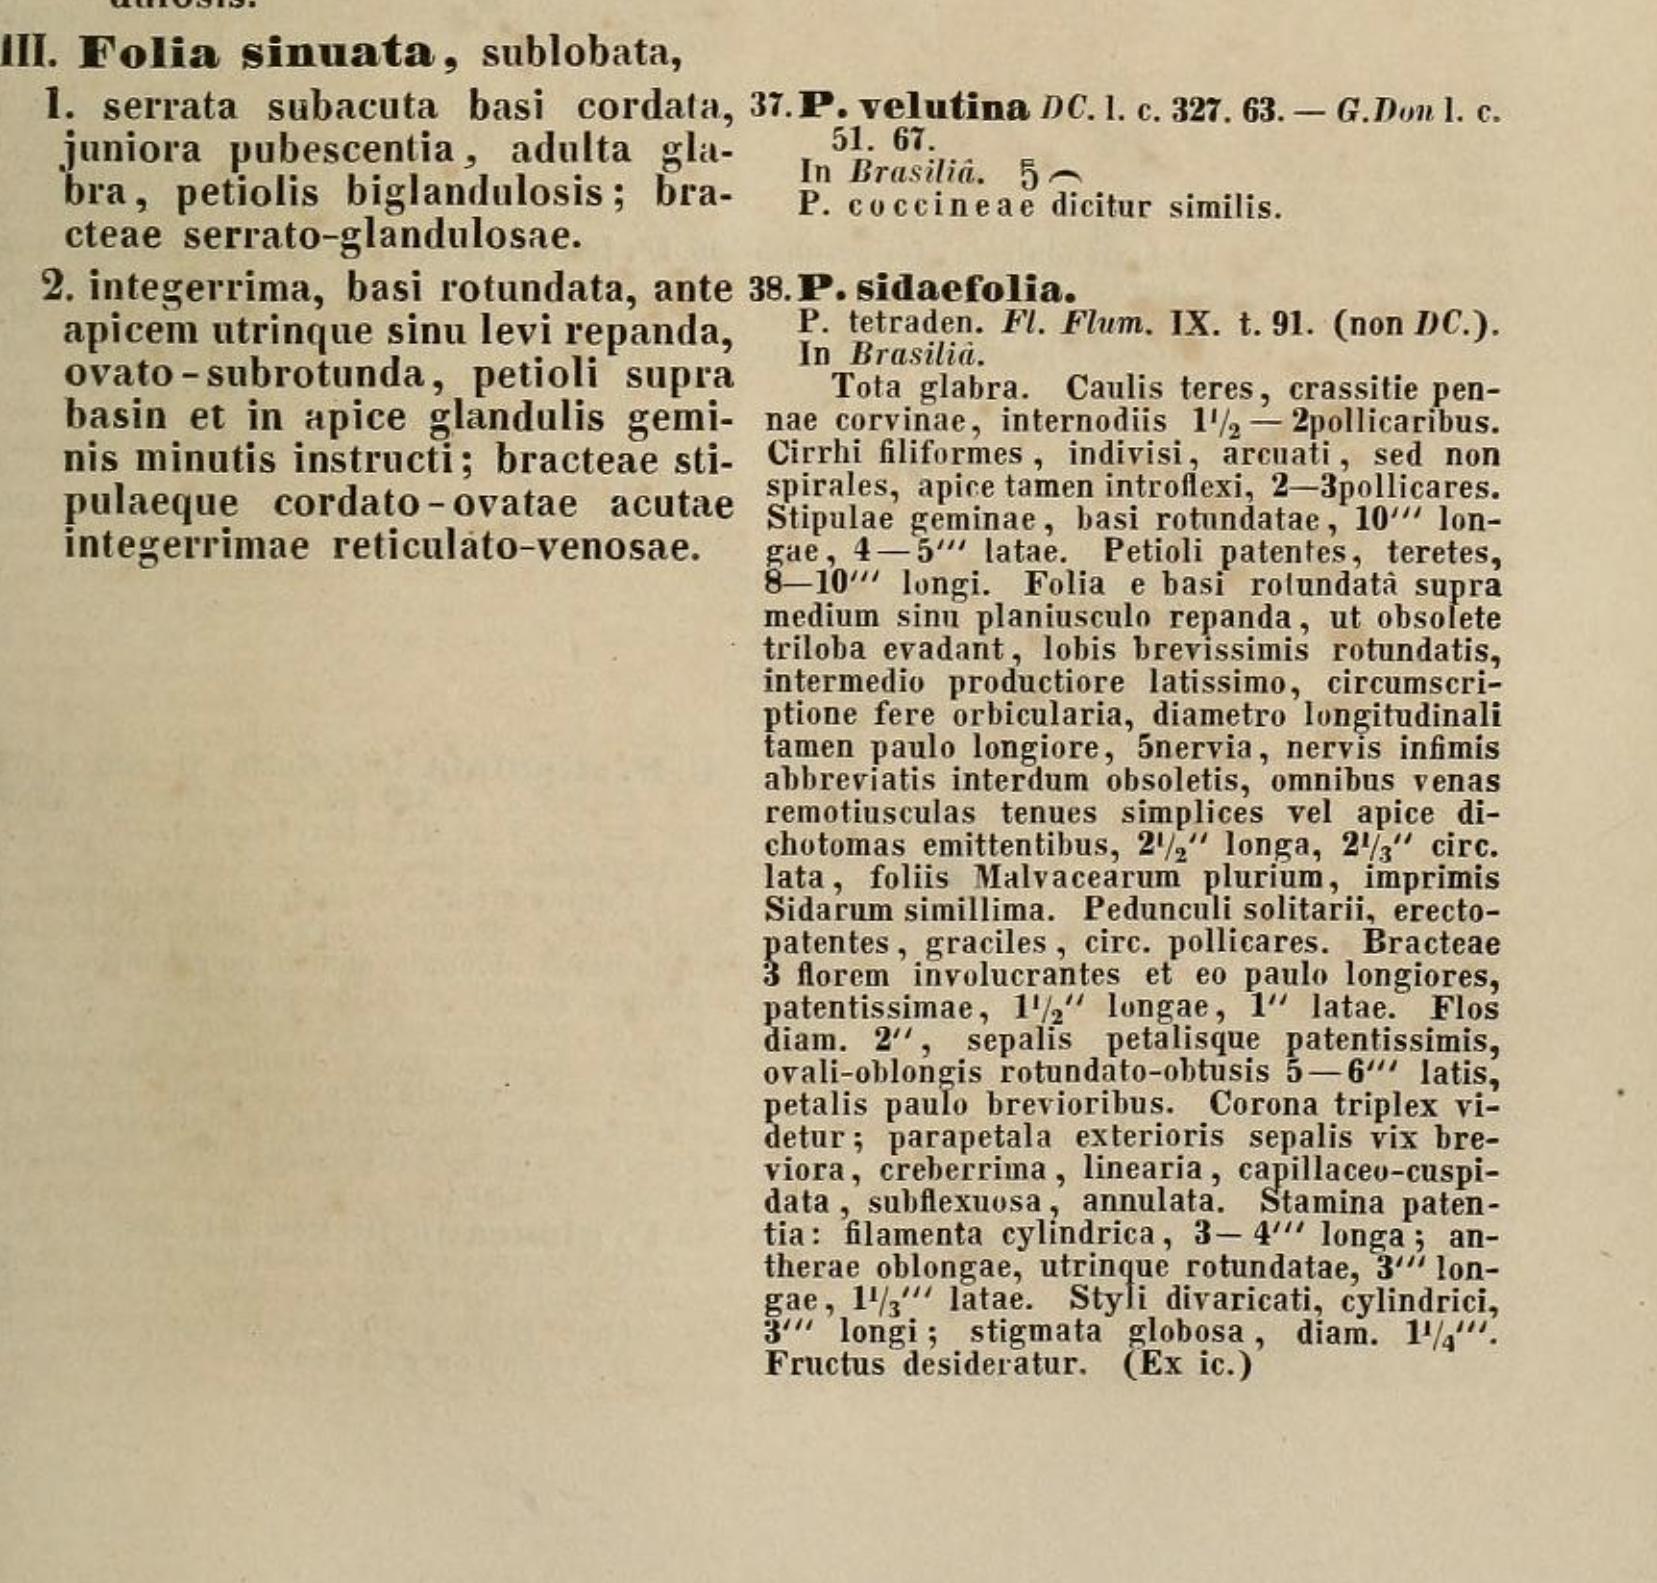 Passiflora sidifolia Roemer